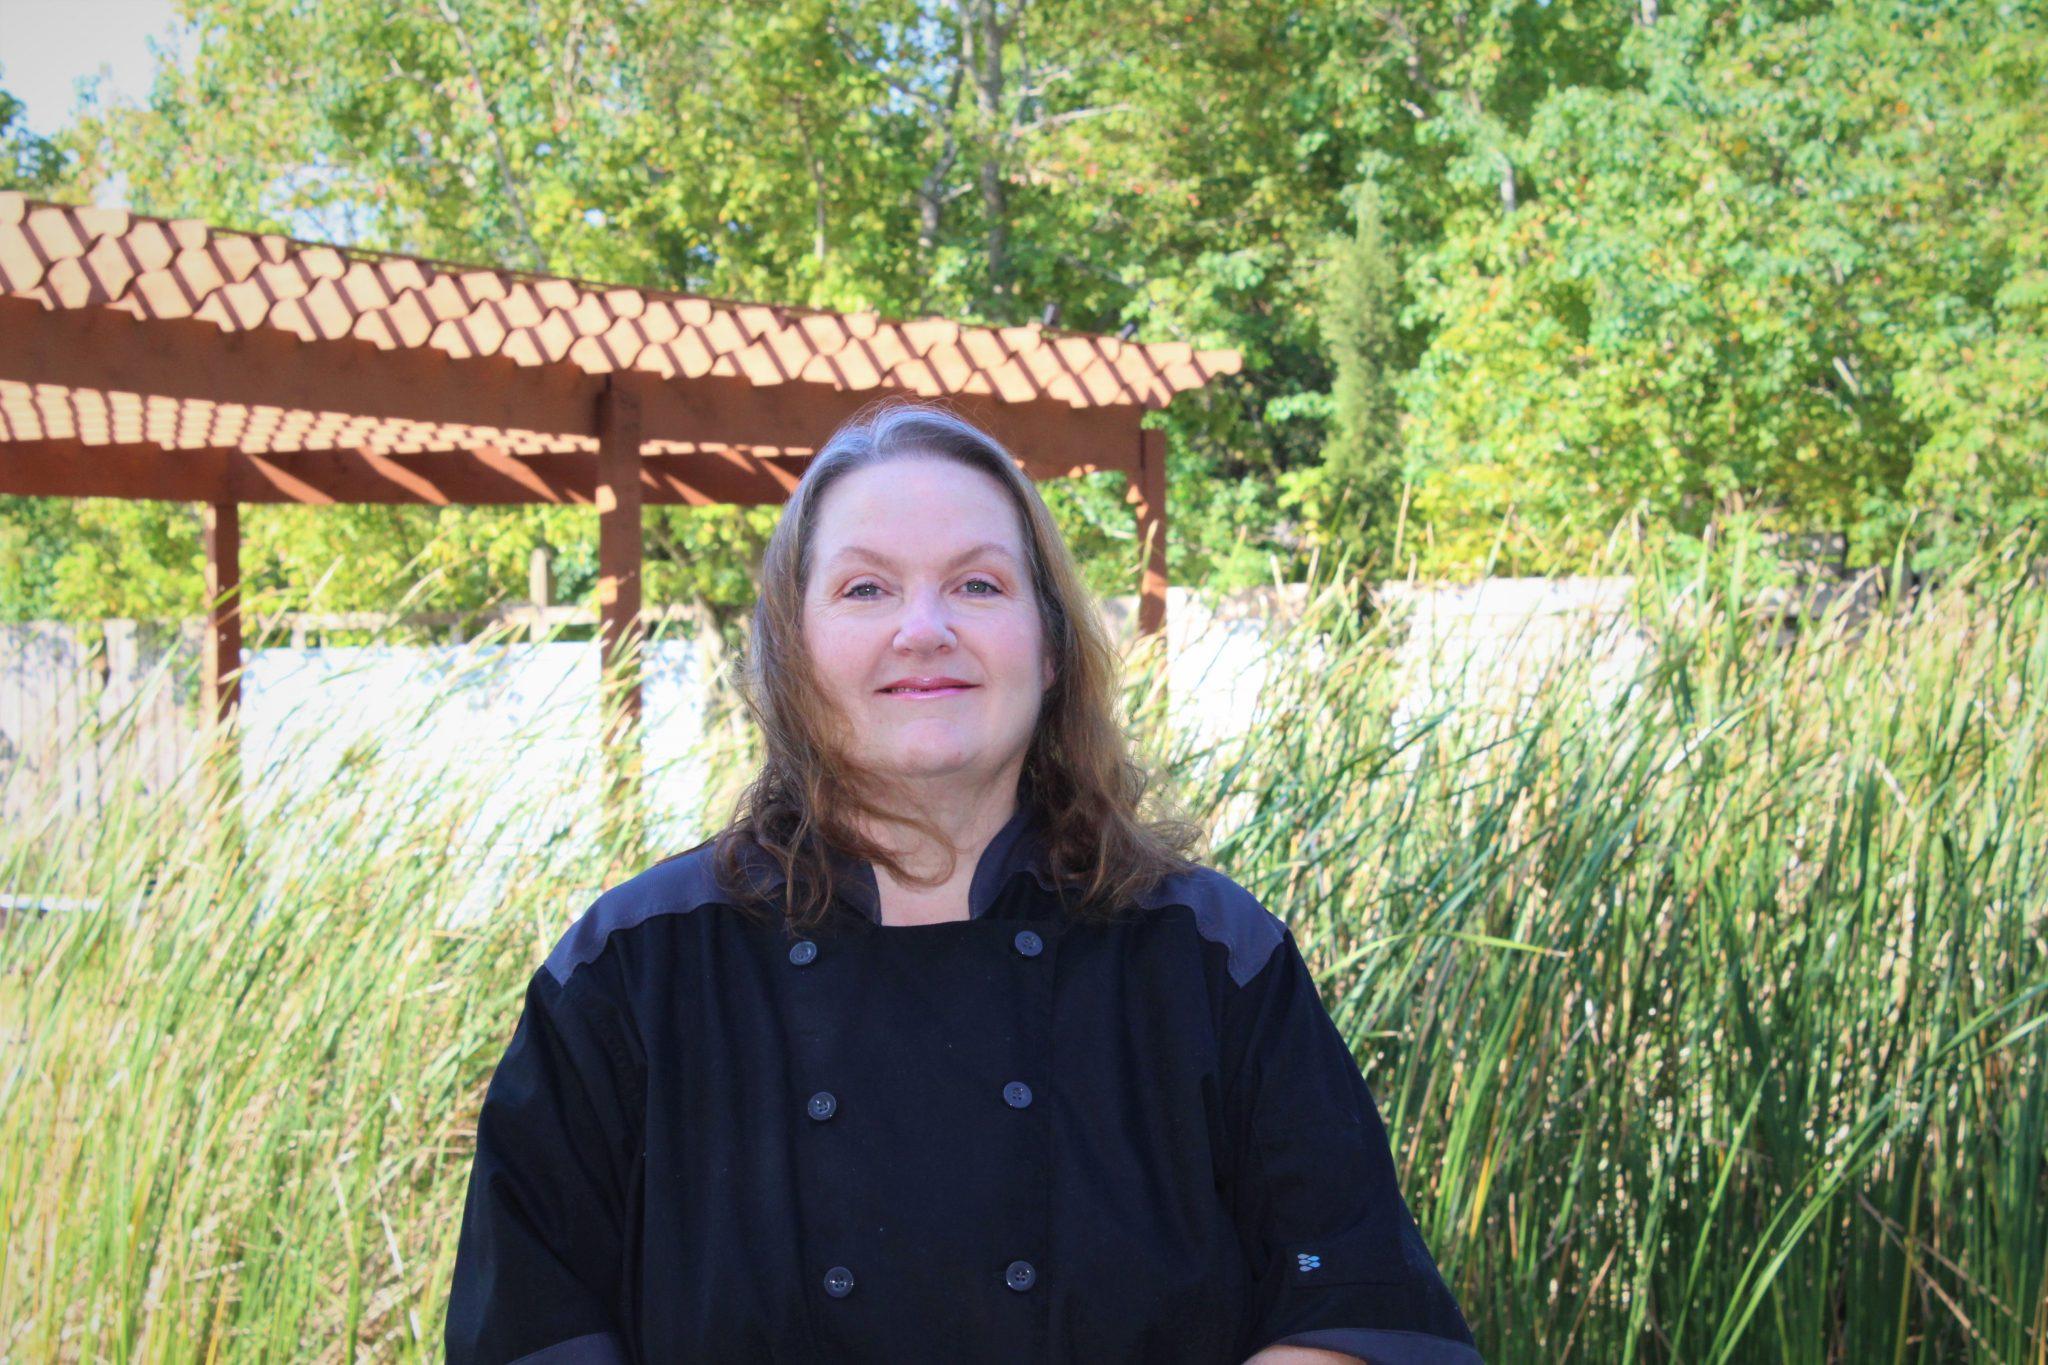 Darlene, head chef at Silver Sycamore